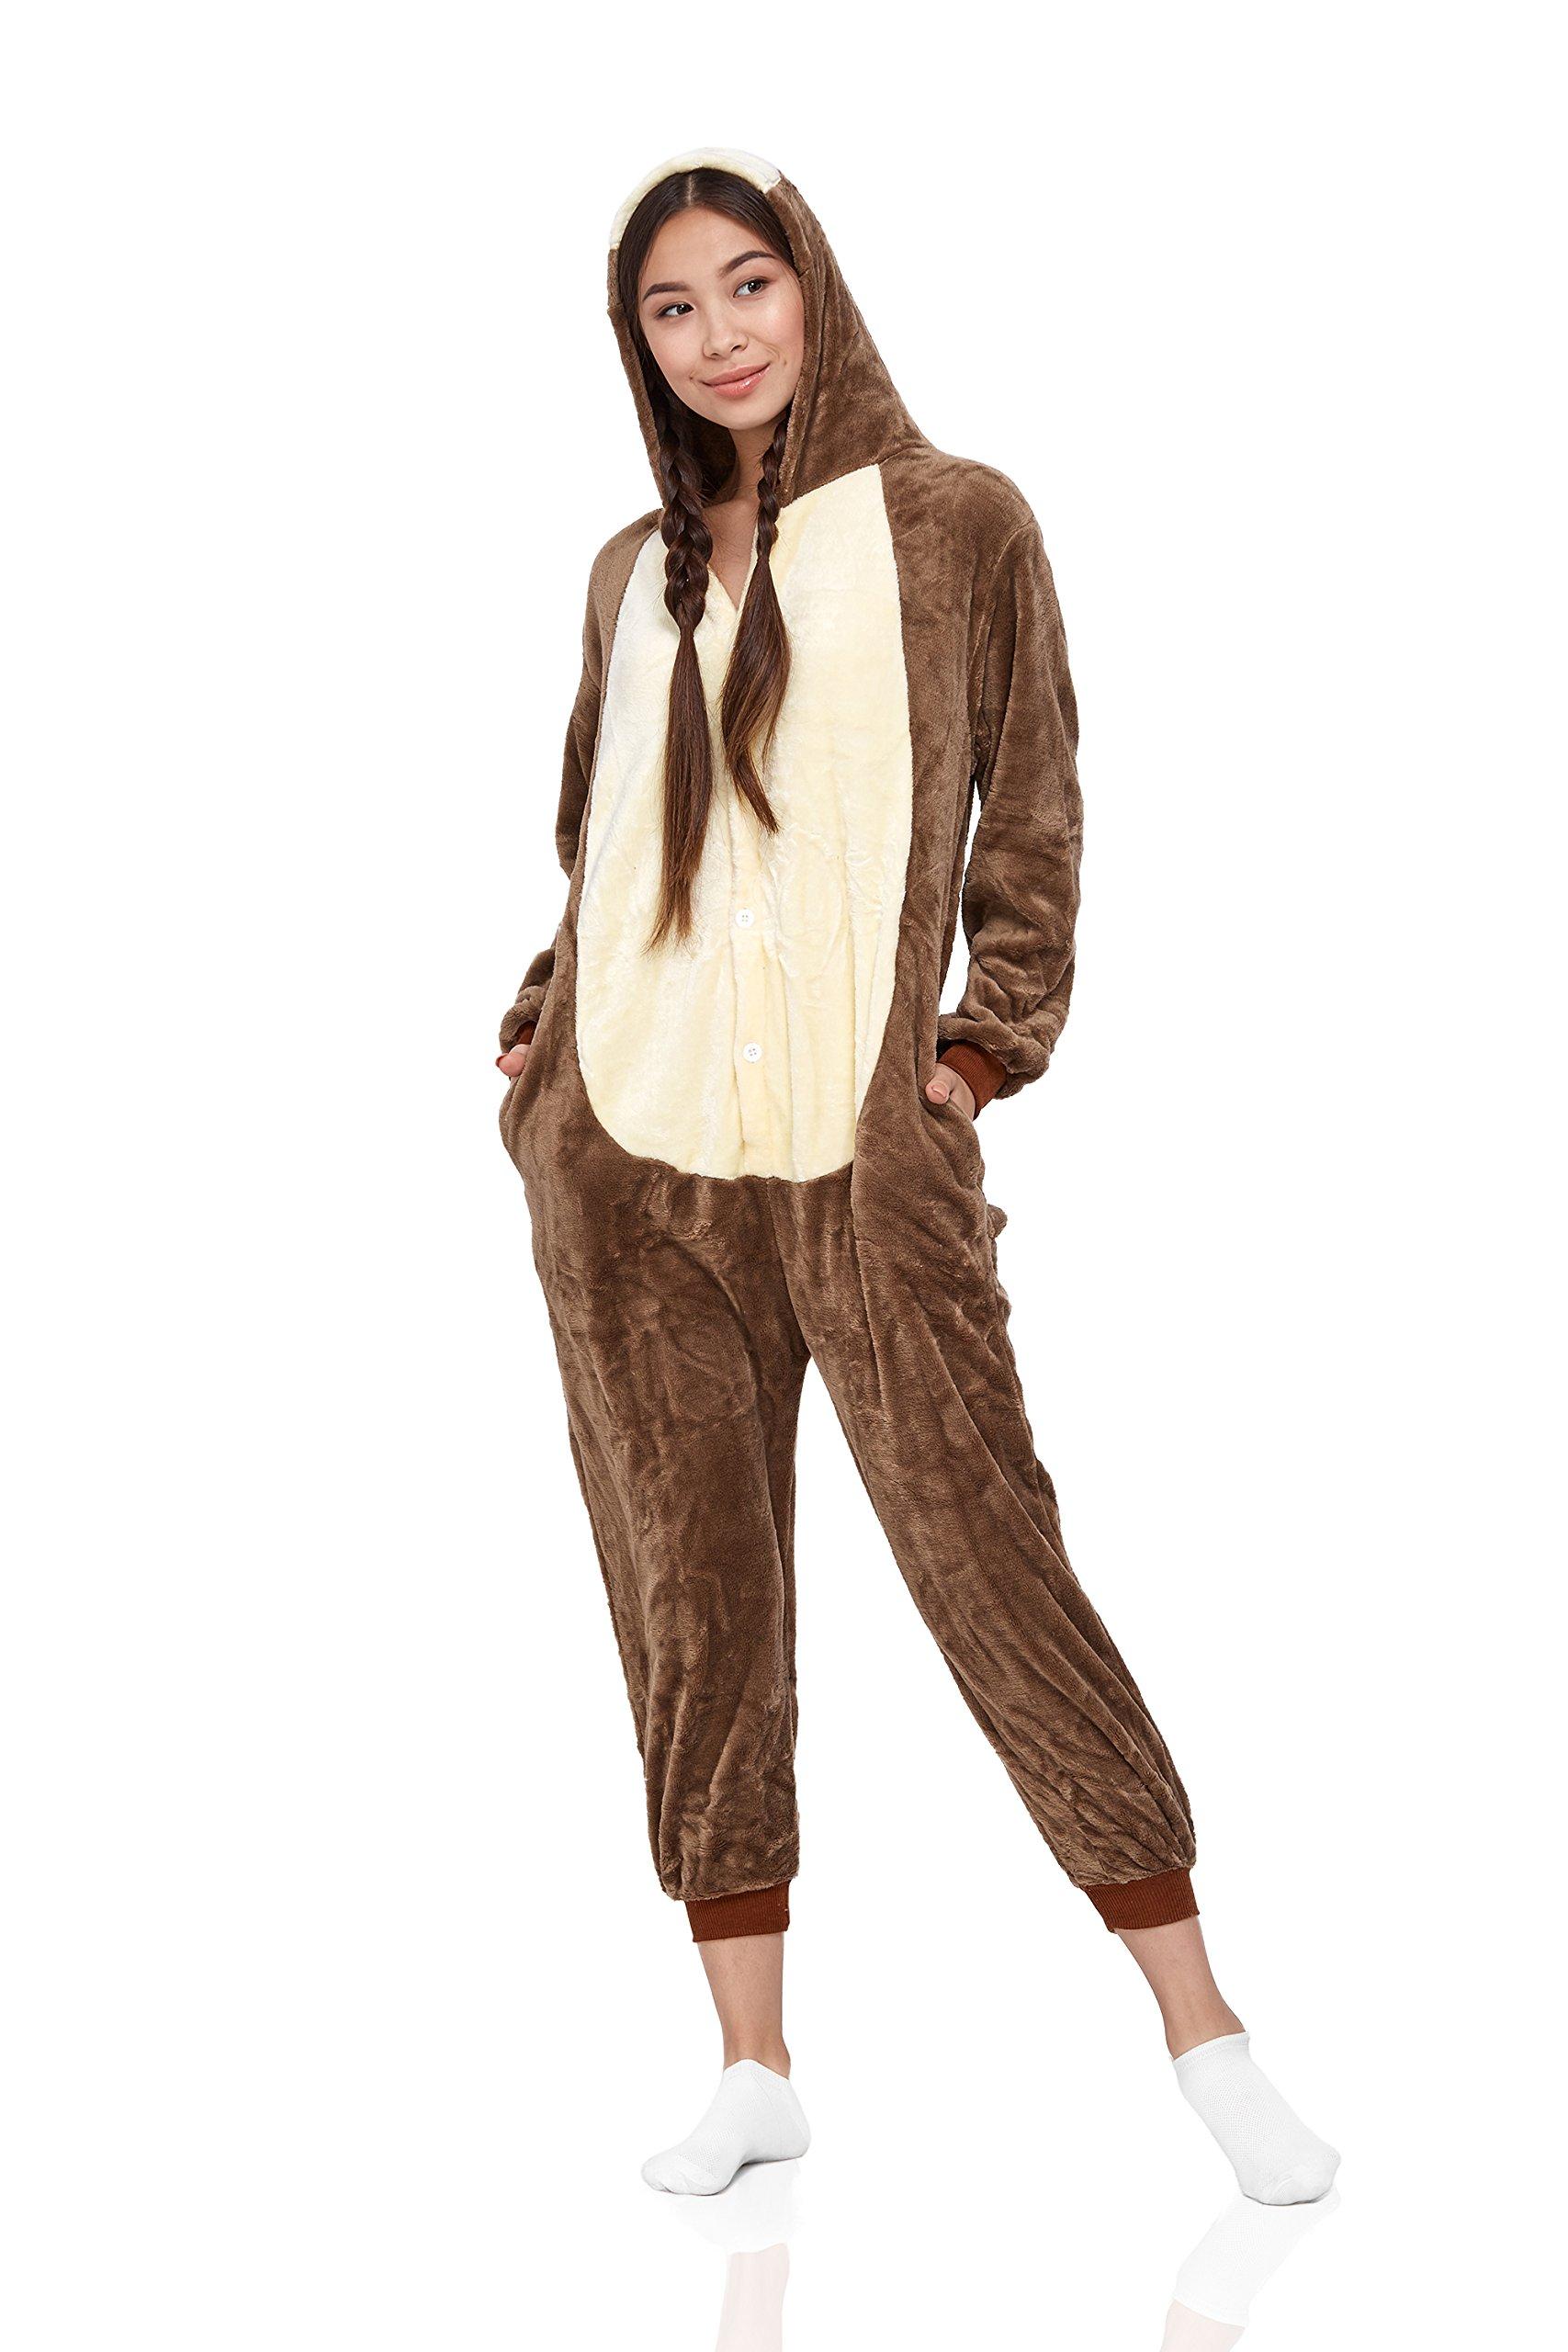 Nothing But Love Adult Ground Squirrel Pajamas Animal Kigurumi Onesie One Piece Cosplay Costume (X-Large, Brown)